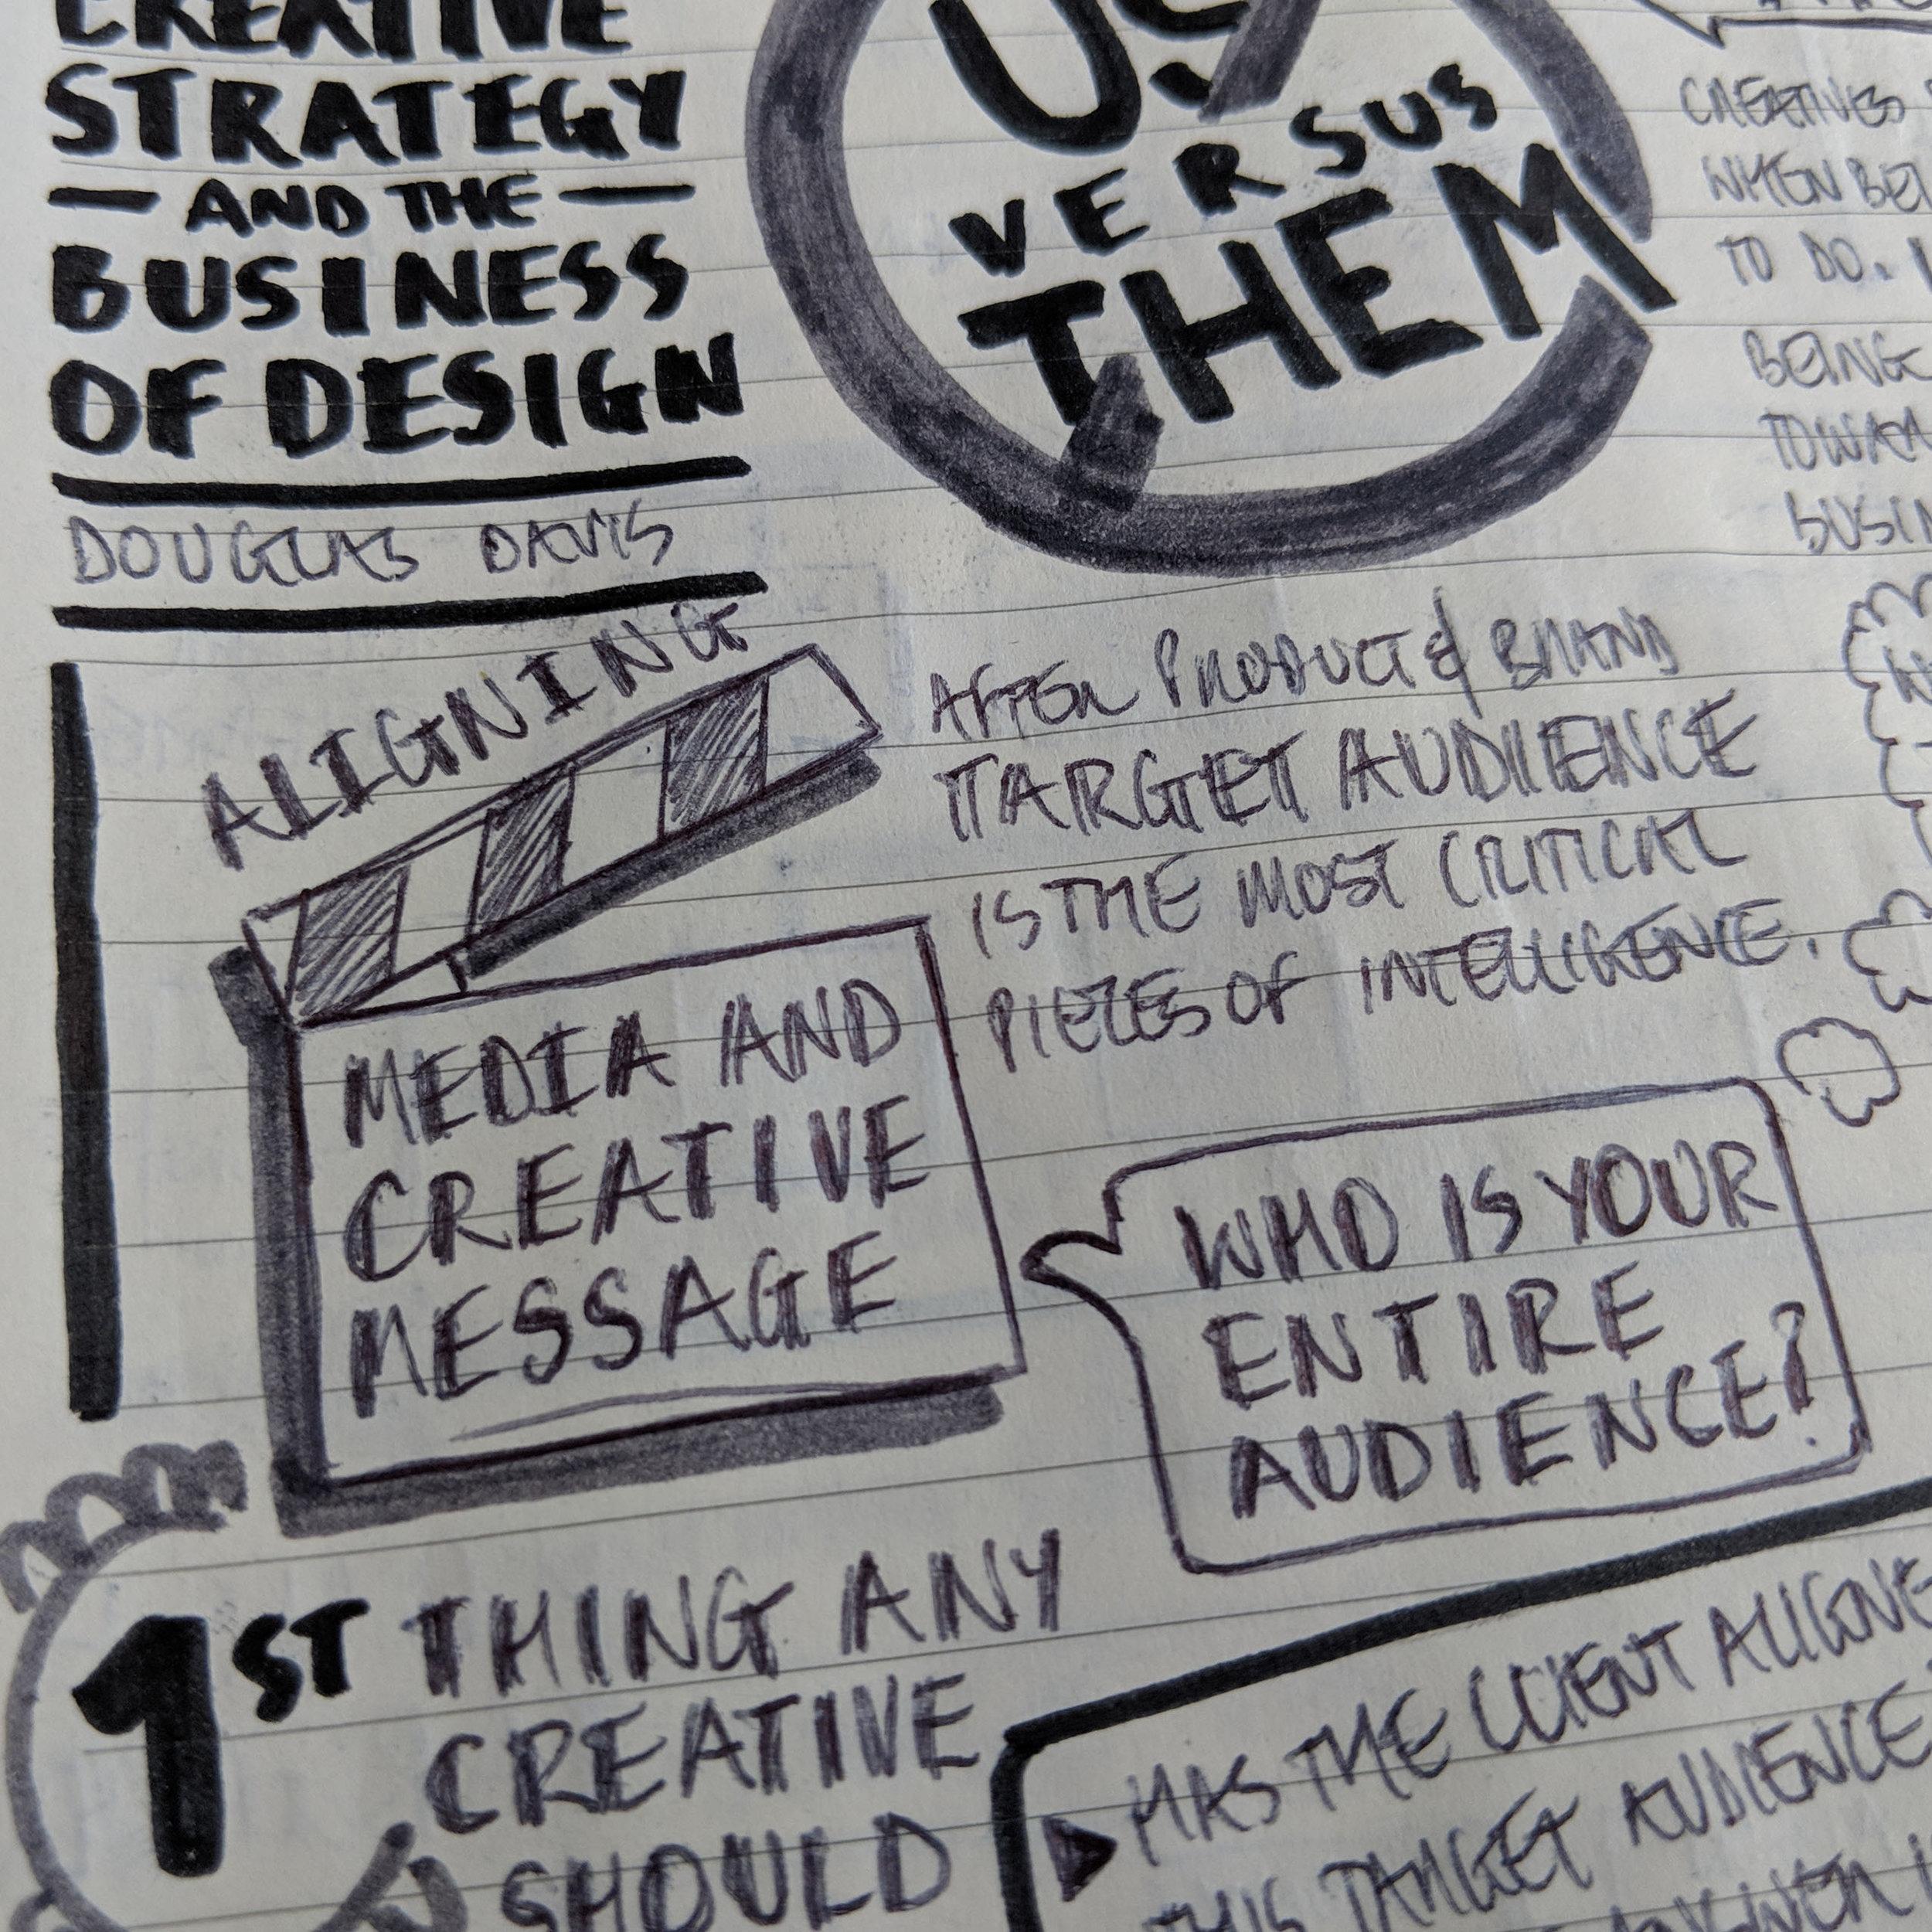 CreativeStrategyAndTheBusinessOfDesign_Part19.4.jpg